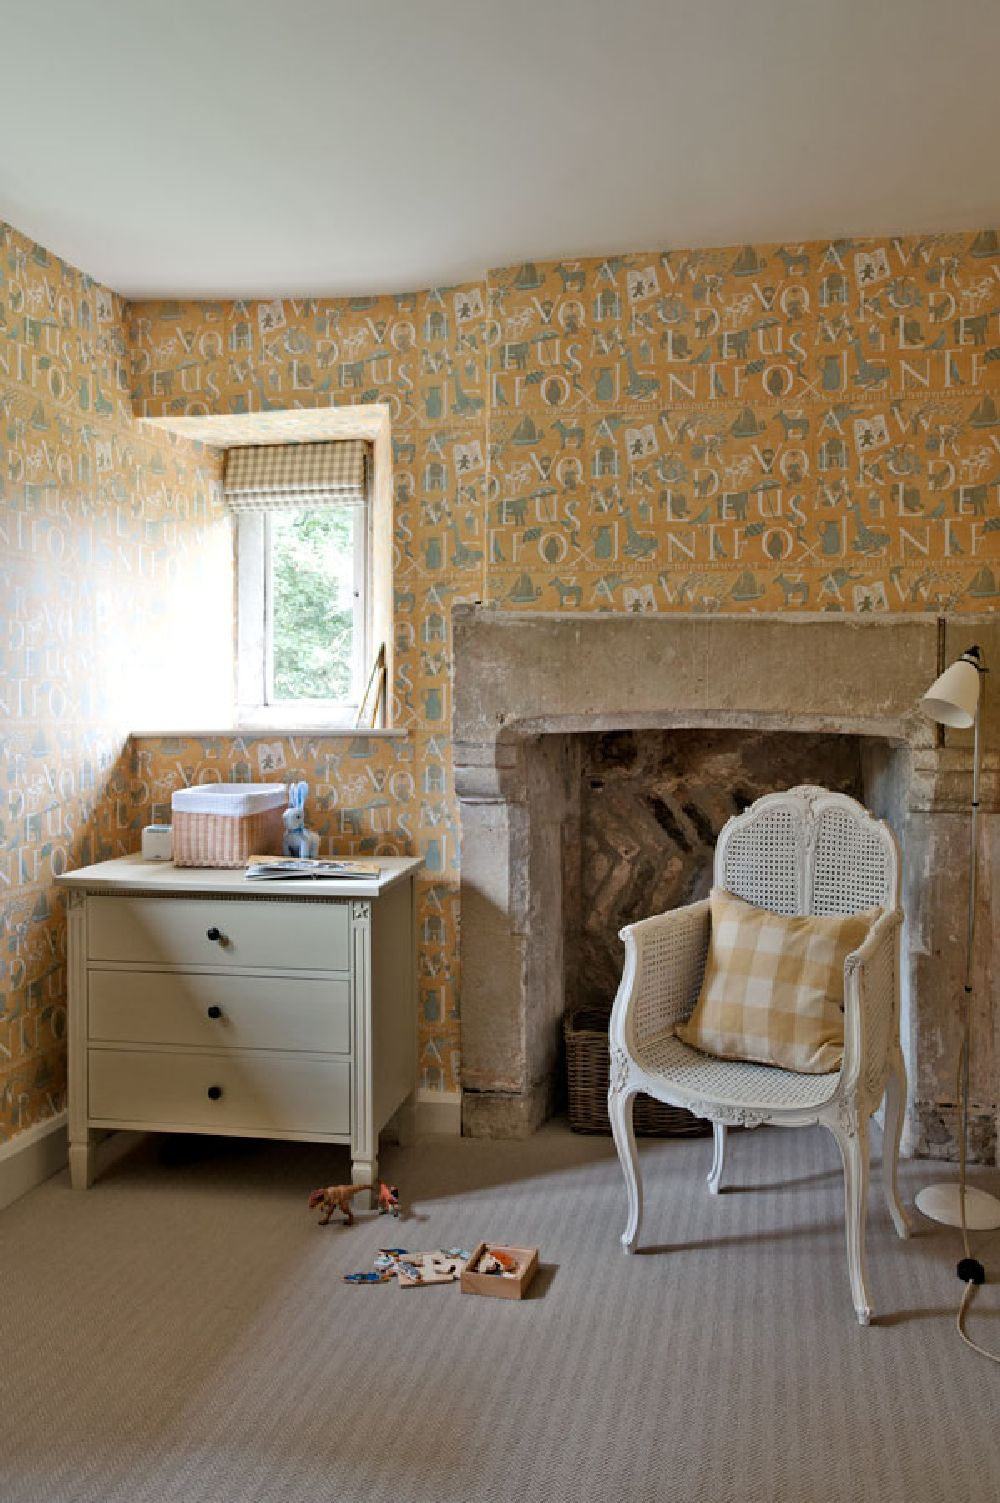 adelaparvu.com despre casa veche Anglia decorata in pasteluri, Design Interior Sims Hilditch Interior Design, Dorset Manor House, Foto Polly Eltes (10)